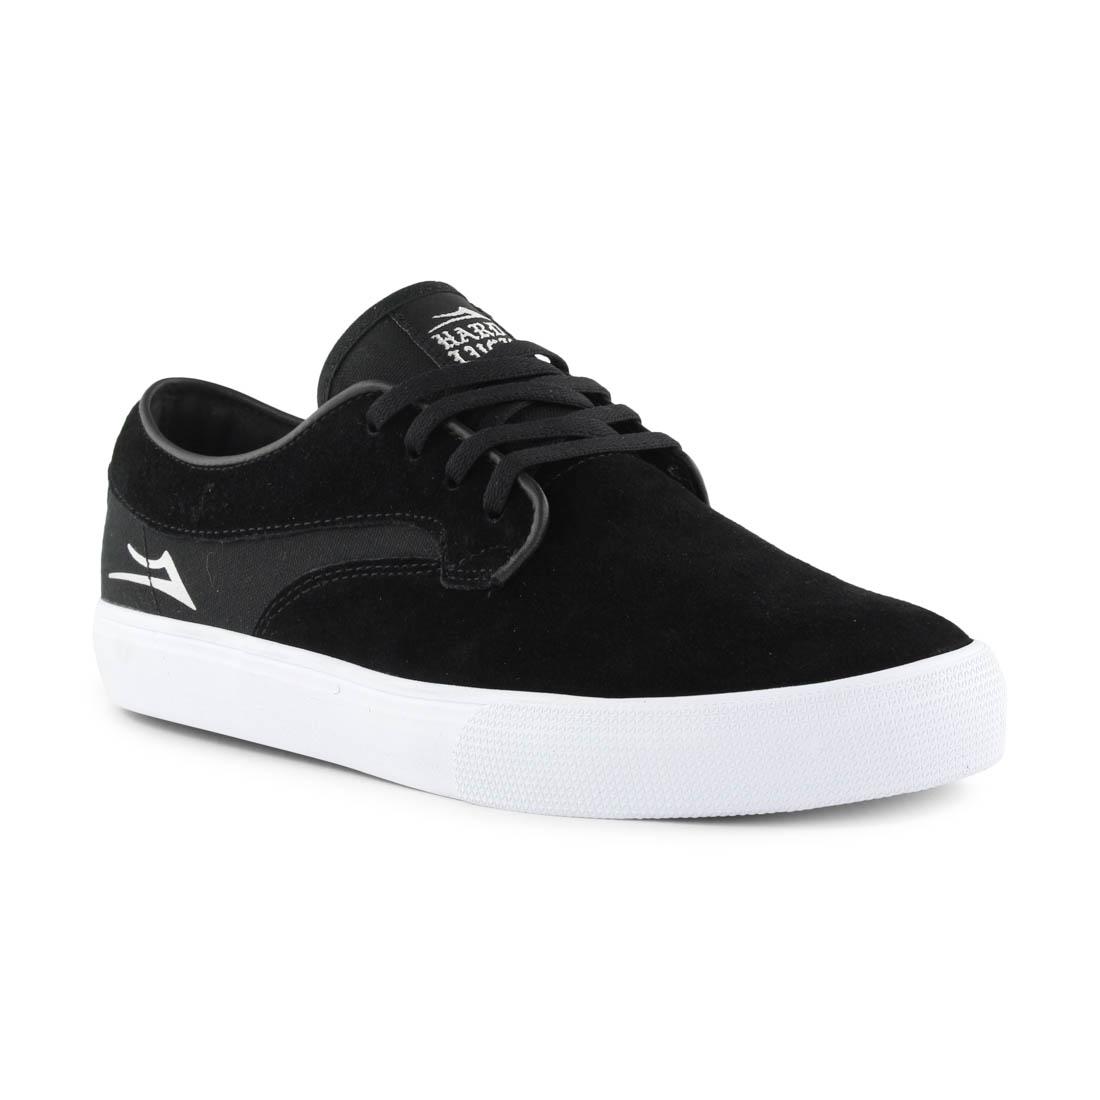 05cd629fc958 ... Skate Shoes / Lakai Shoes x Hard Luck Riley Hawk – Black Suede. Lakai  Riley Hawk Black Suede